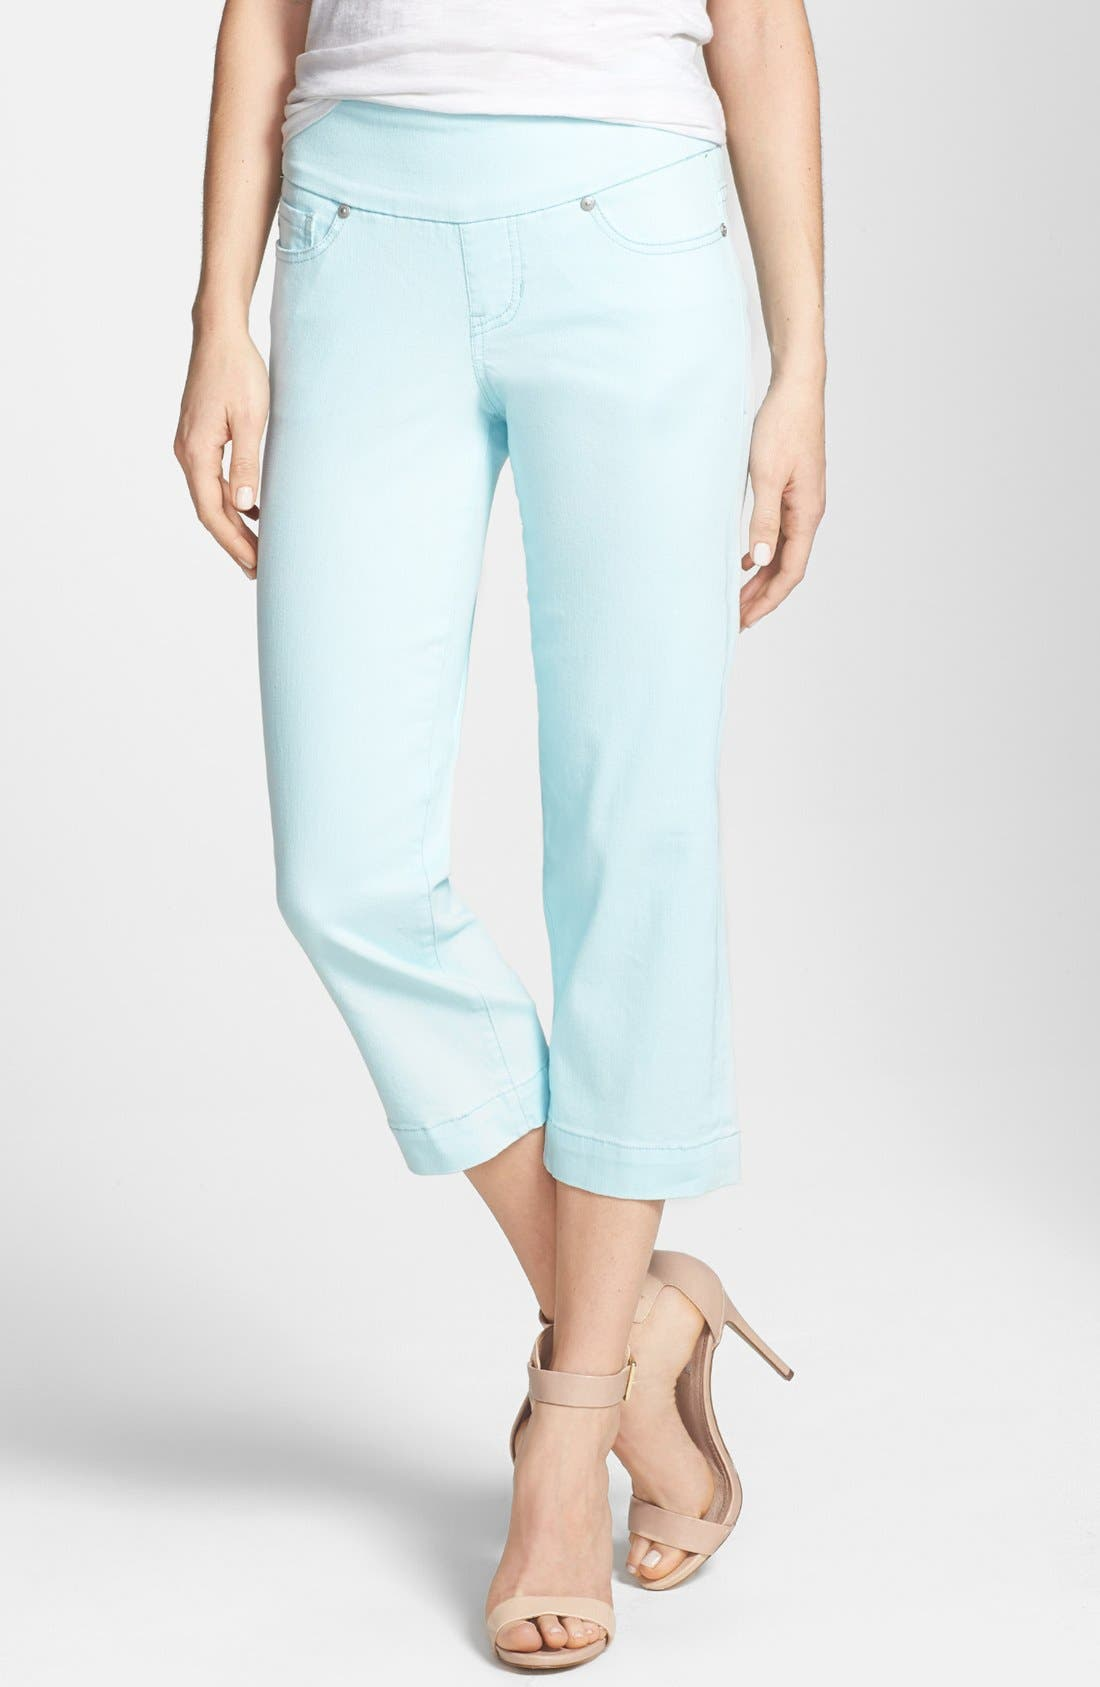 Main Image - Jag Jeans 'Felicia' Crop Stretch Denim Jeans (Petite)